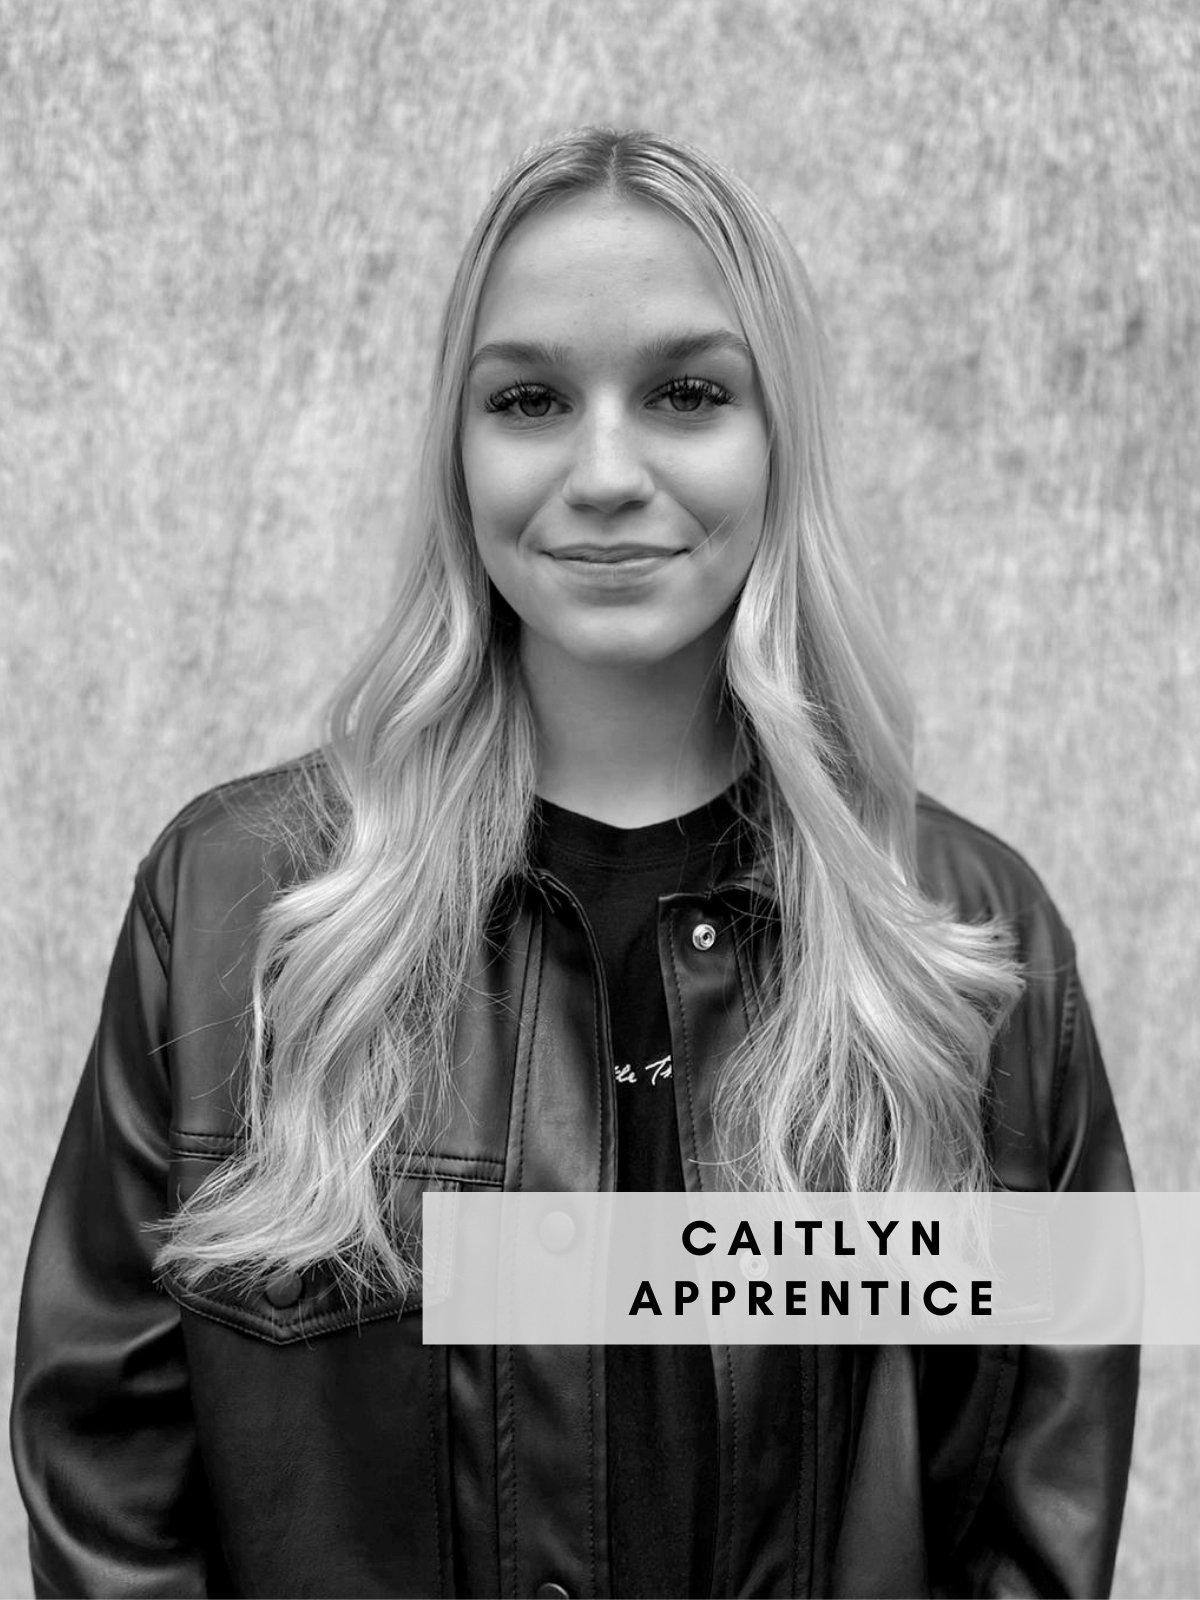 Caitlyn – Apprentice